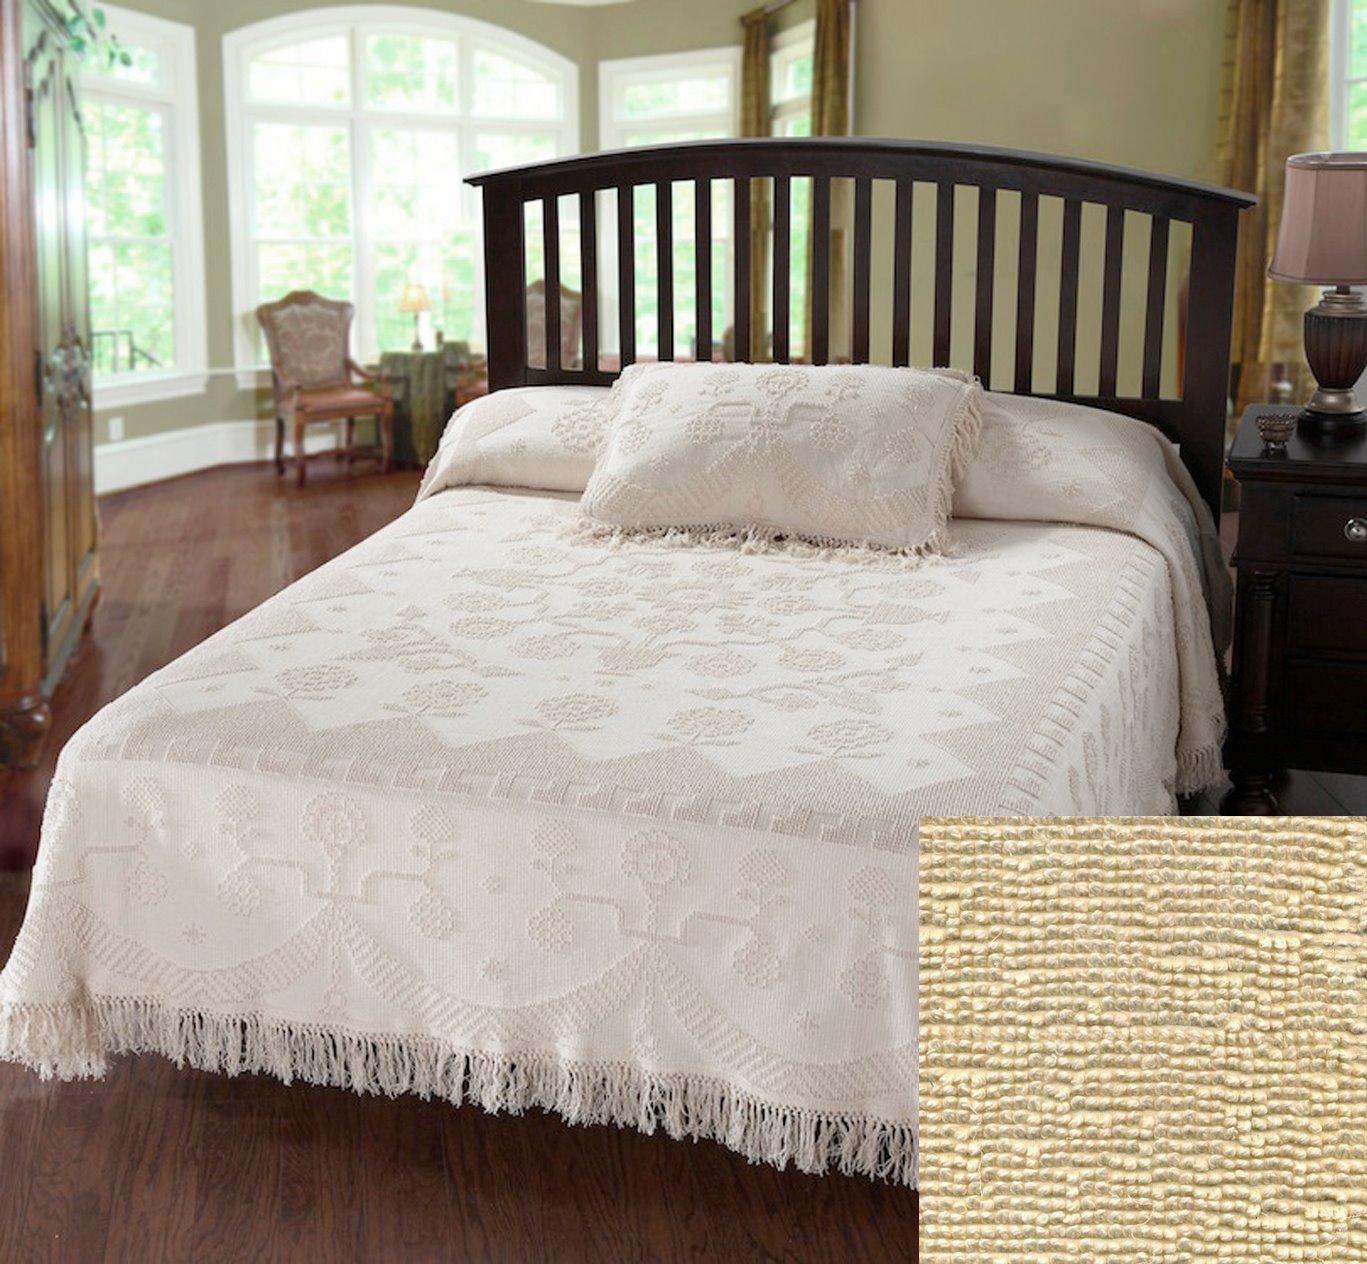 George Washington Bedspread Queen Antique Pc Fallon